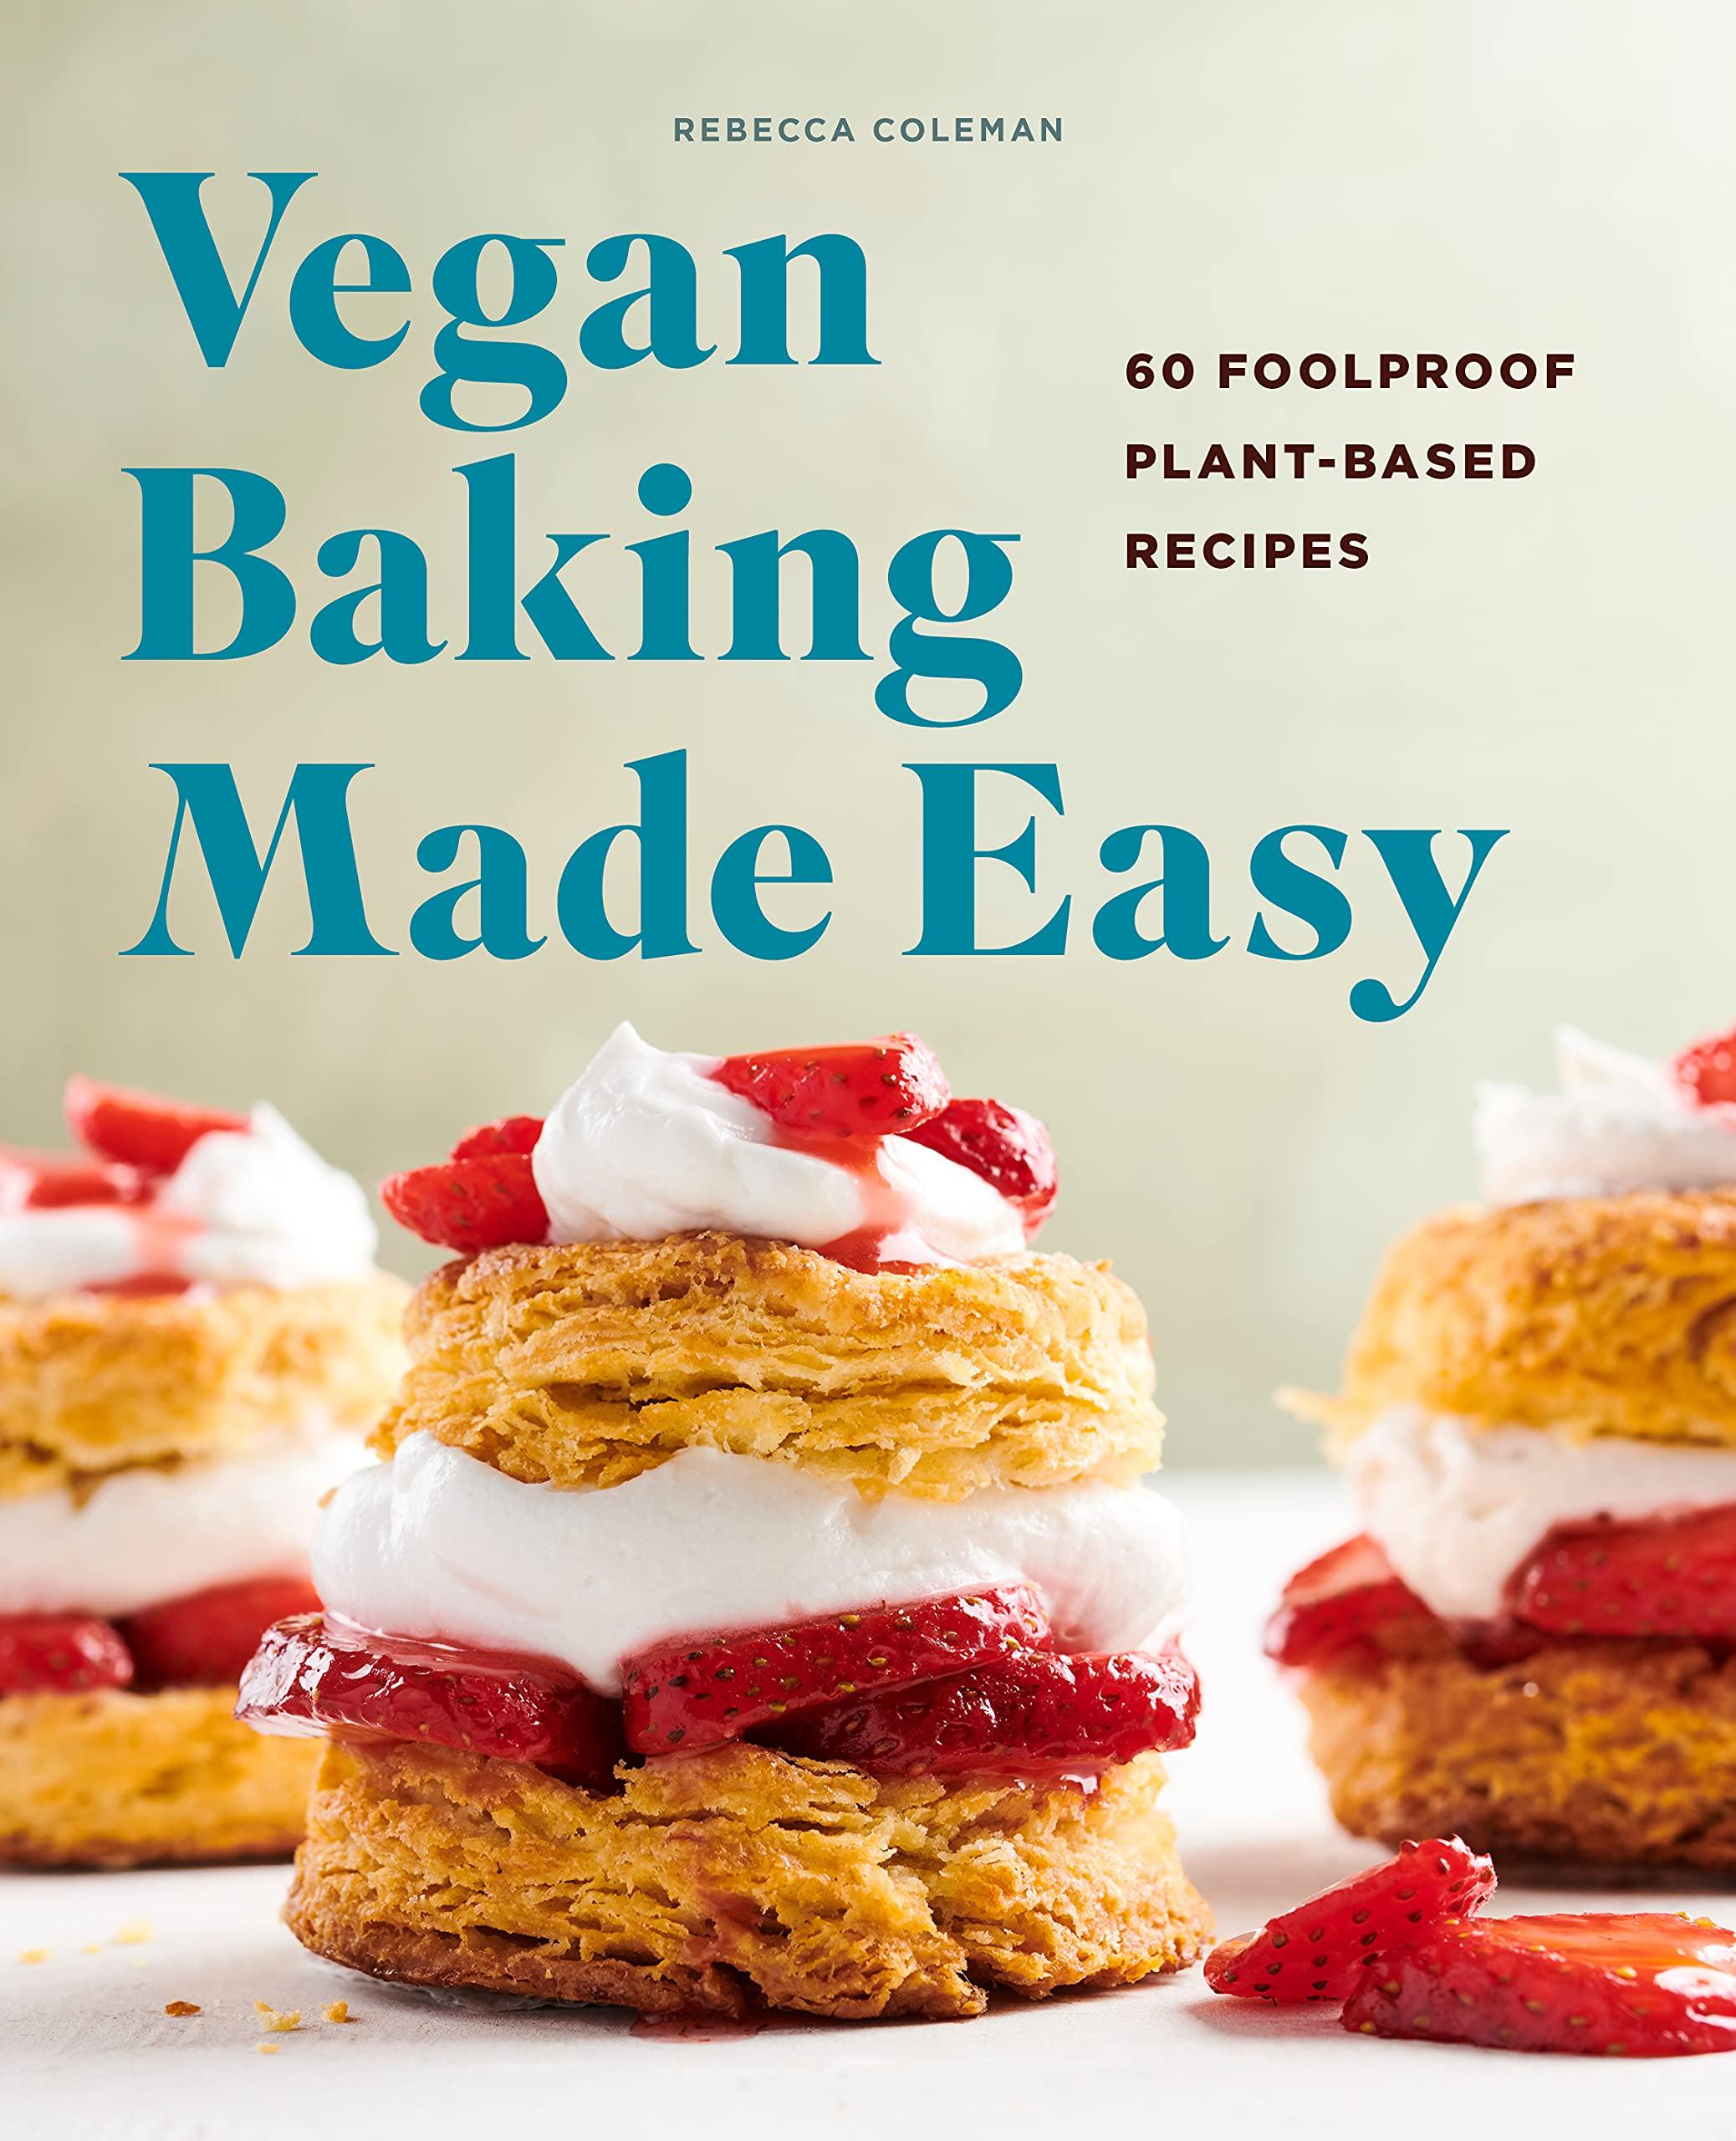 Introducing: Vegan Baking Made Easy